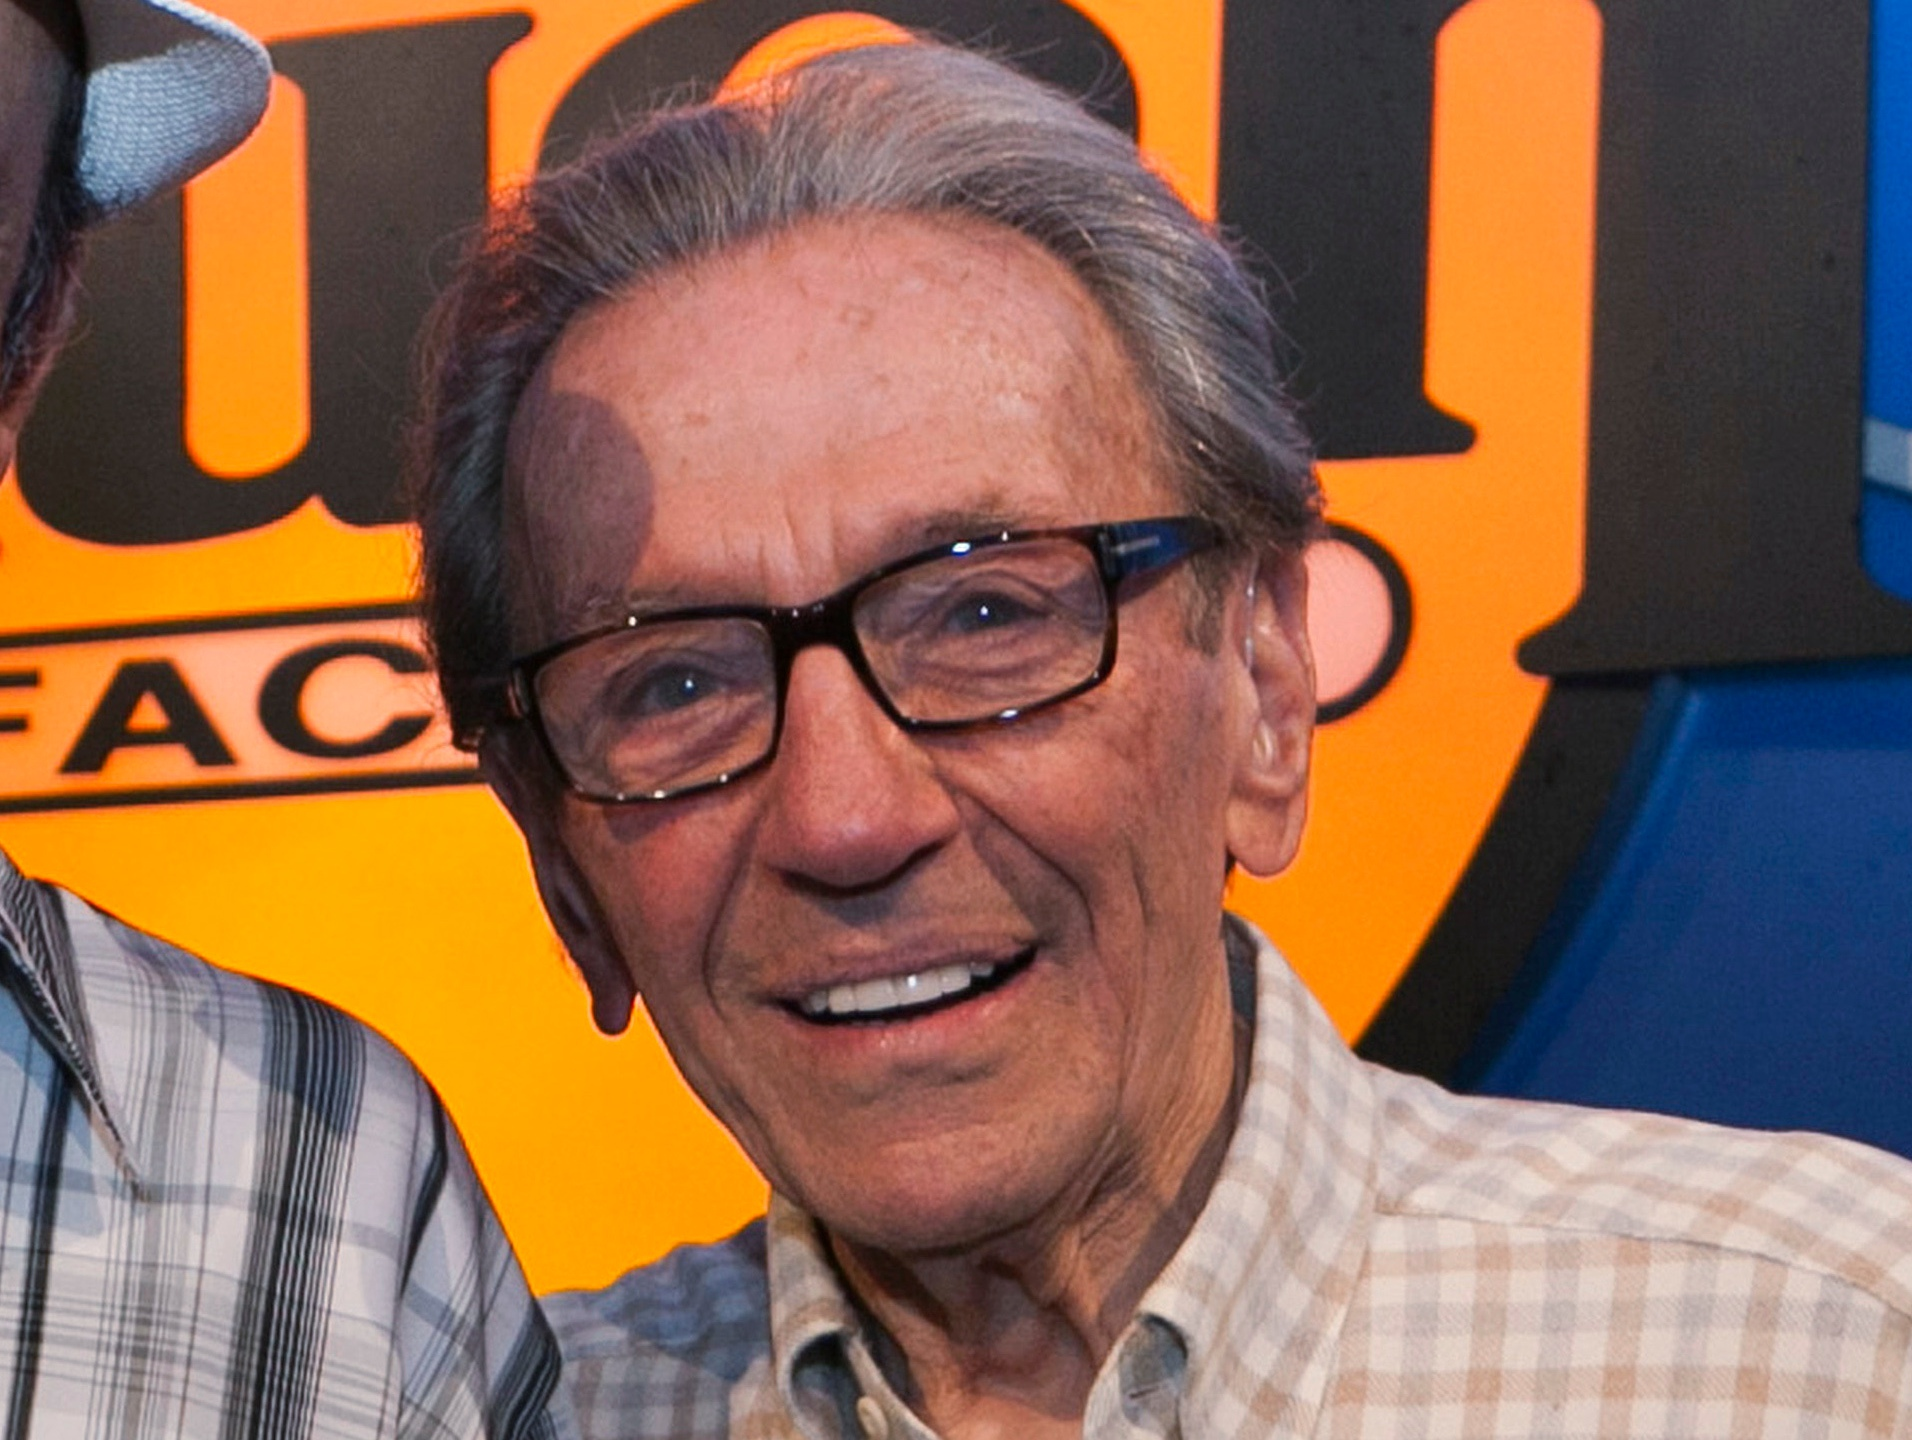 Paul Rodriguez, Norm Crosby